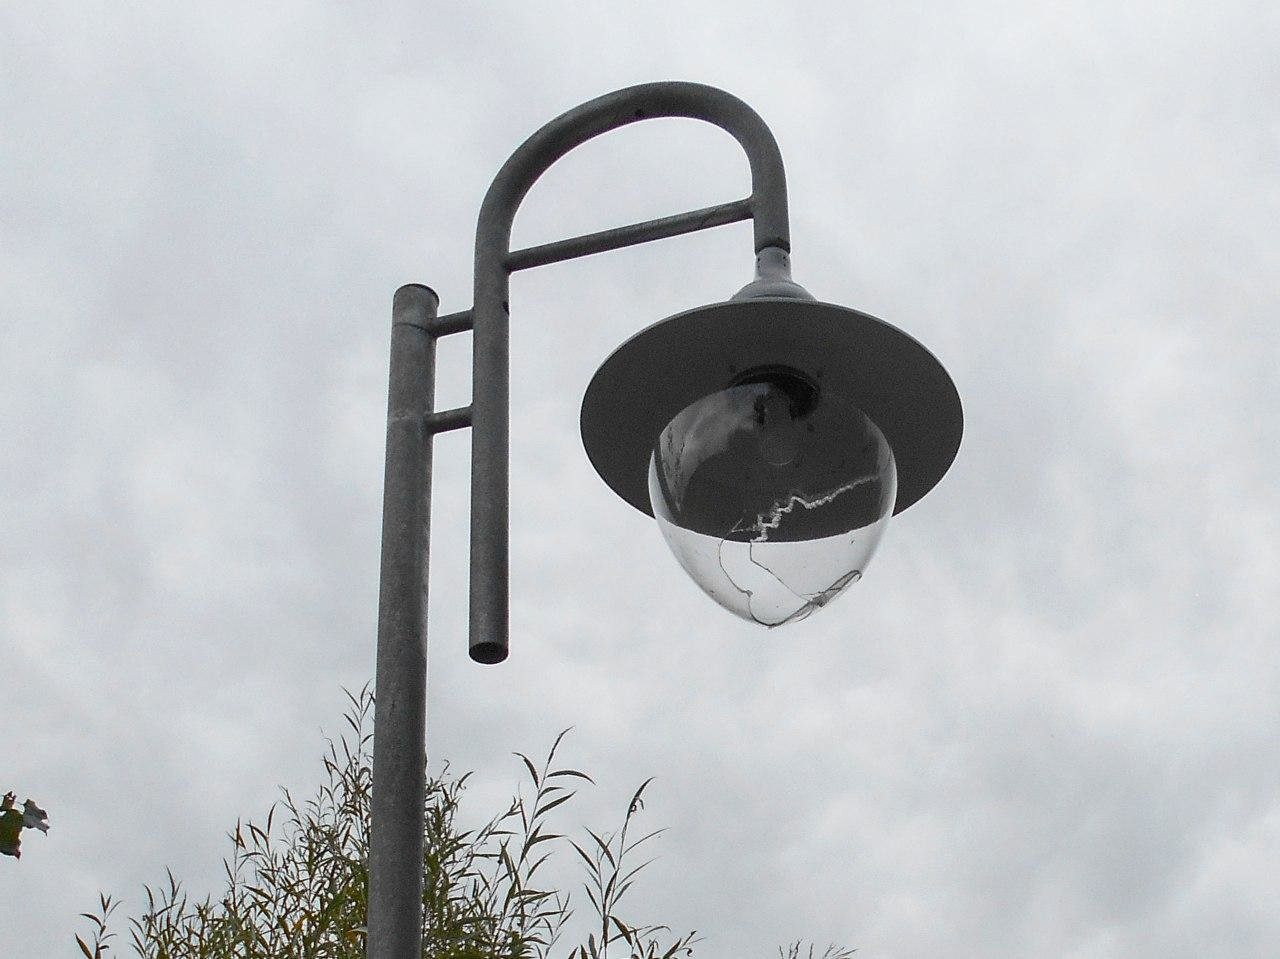 В Белгороде на новой велодорожке разбили фонари, фото-3